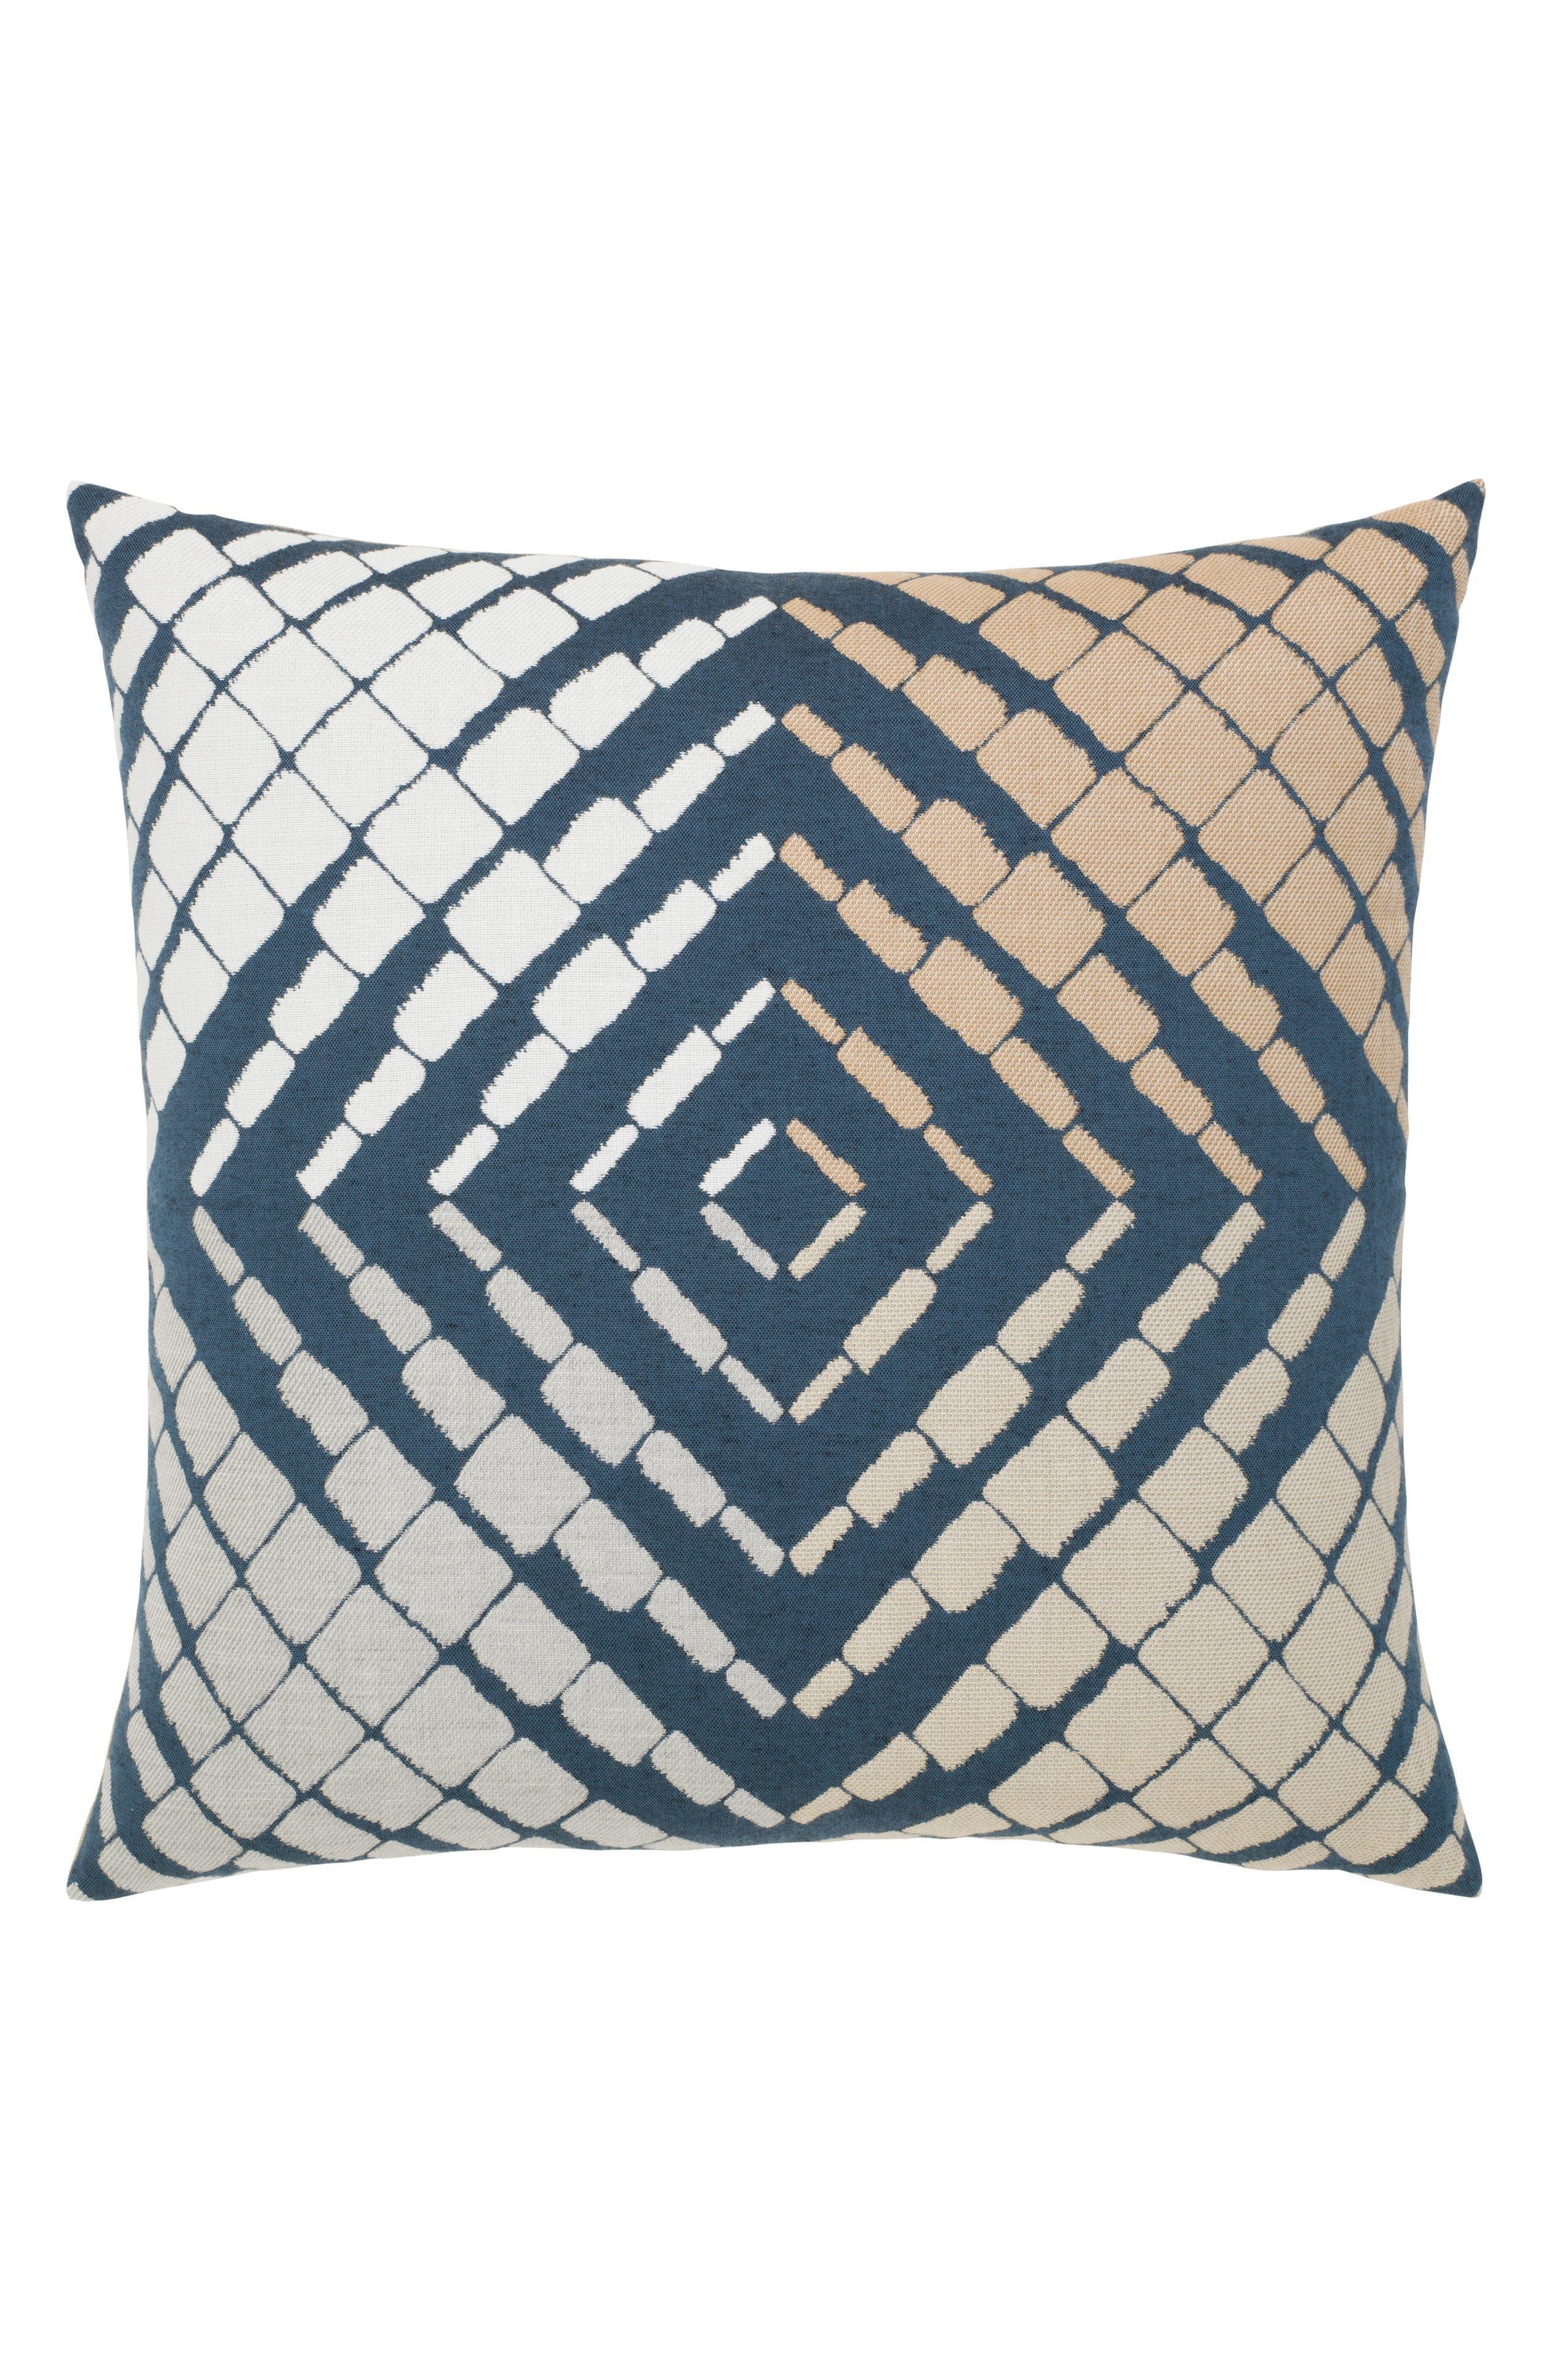 Progression Accent Pillow,                             Main thumbnail 1, color,                             BLUE/ BROWN